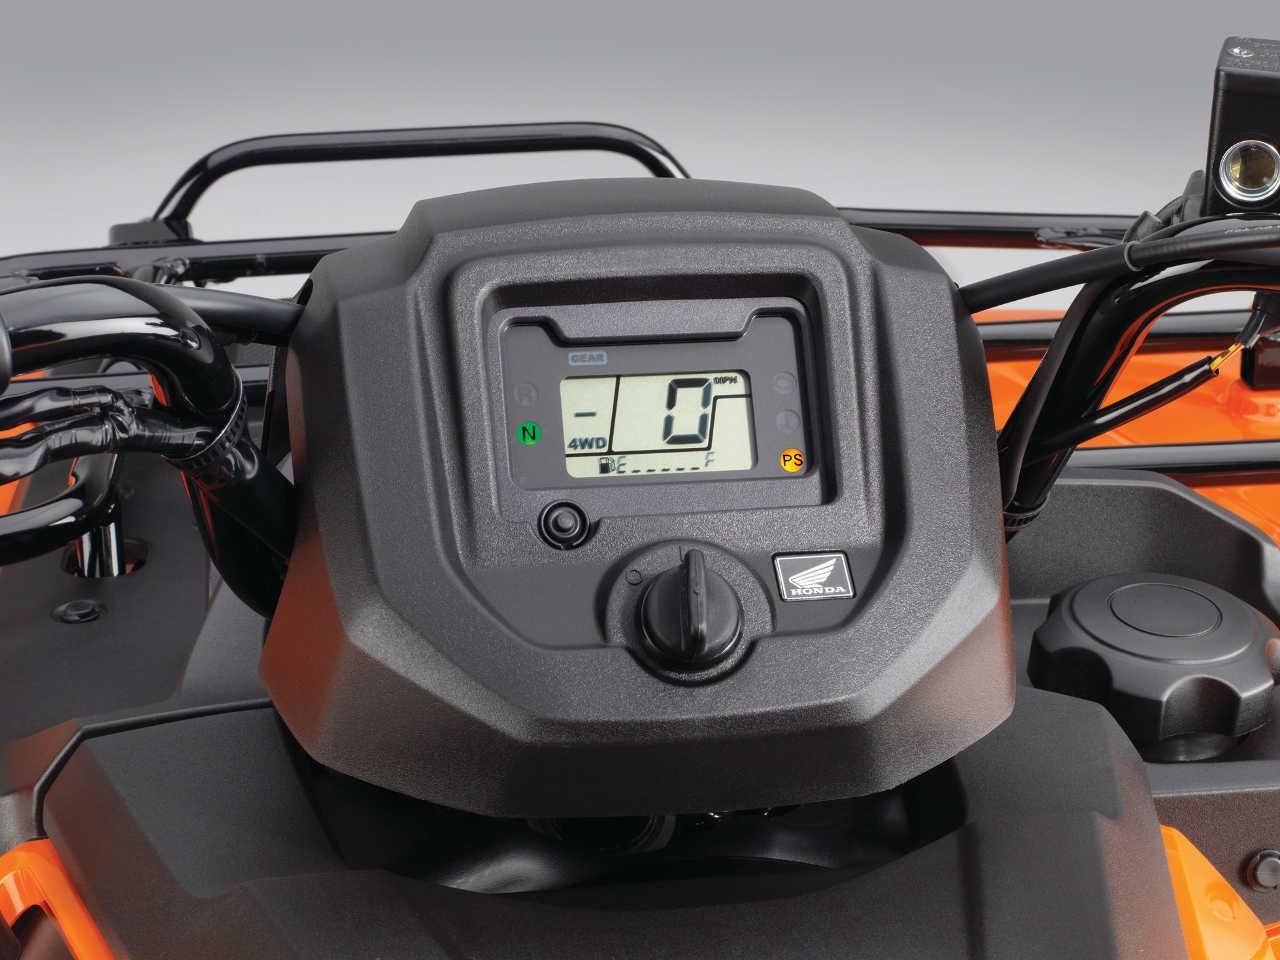 2014 Honda Fourtrax Rancher ATV Review  ATV Illustrated